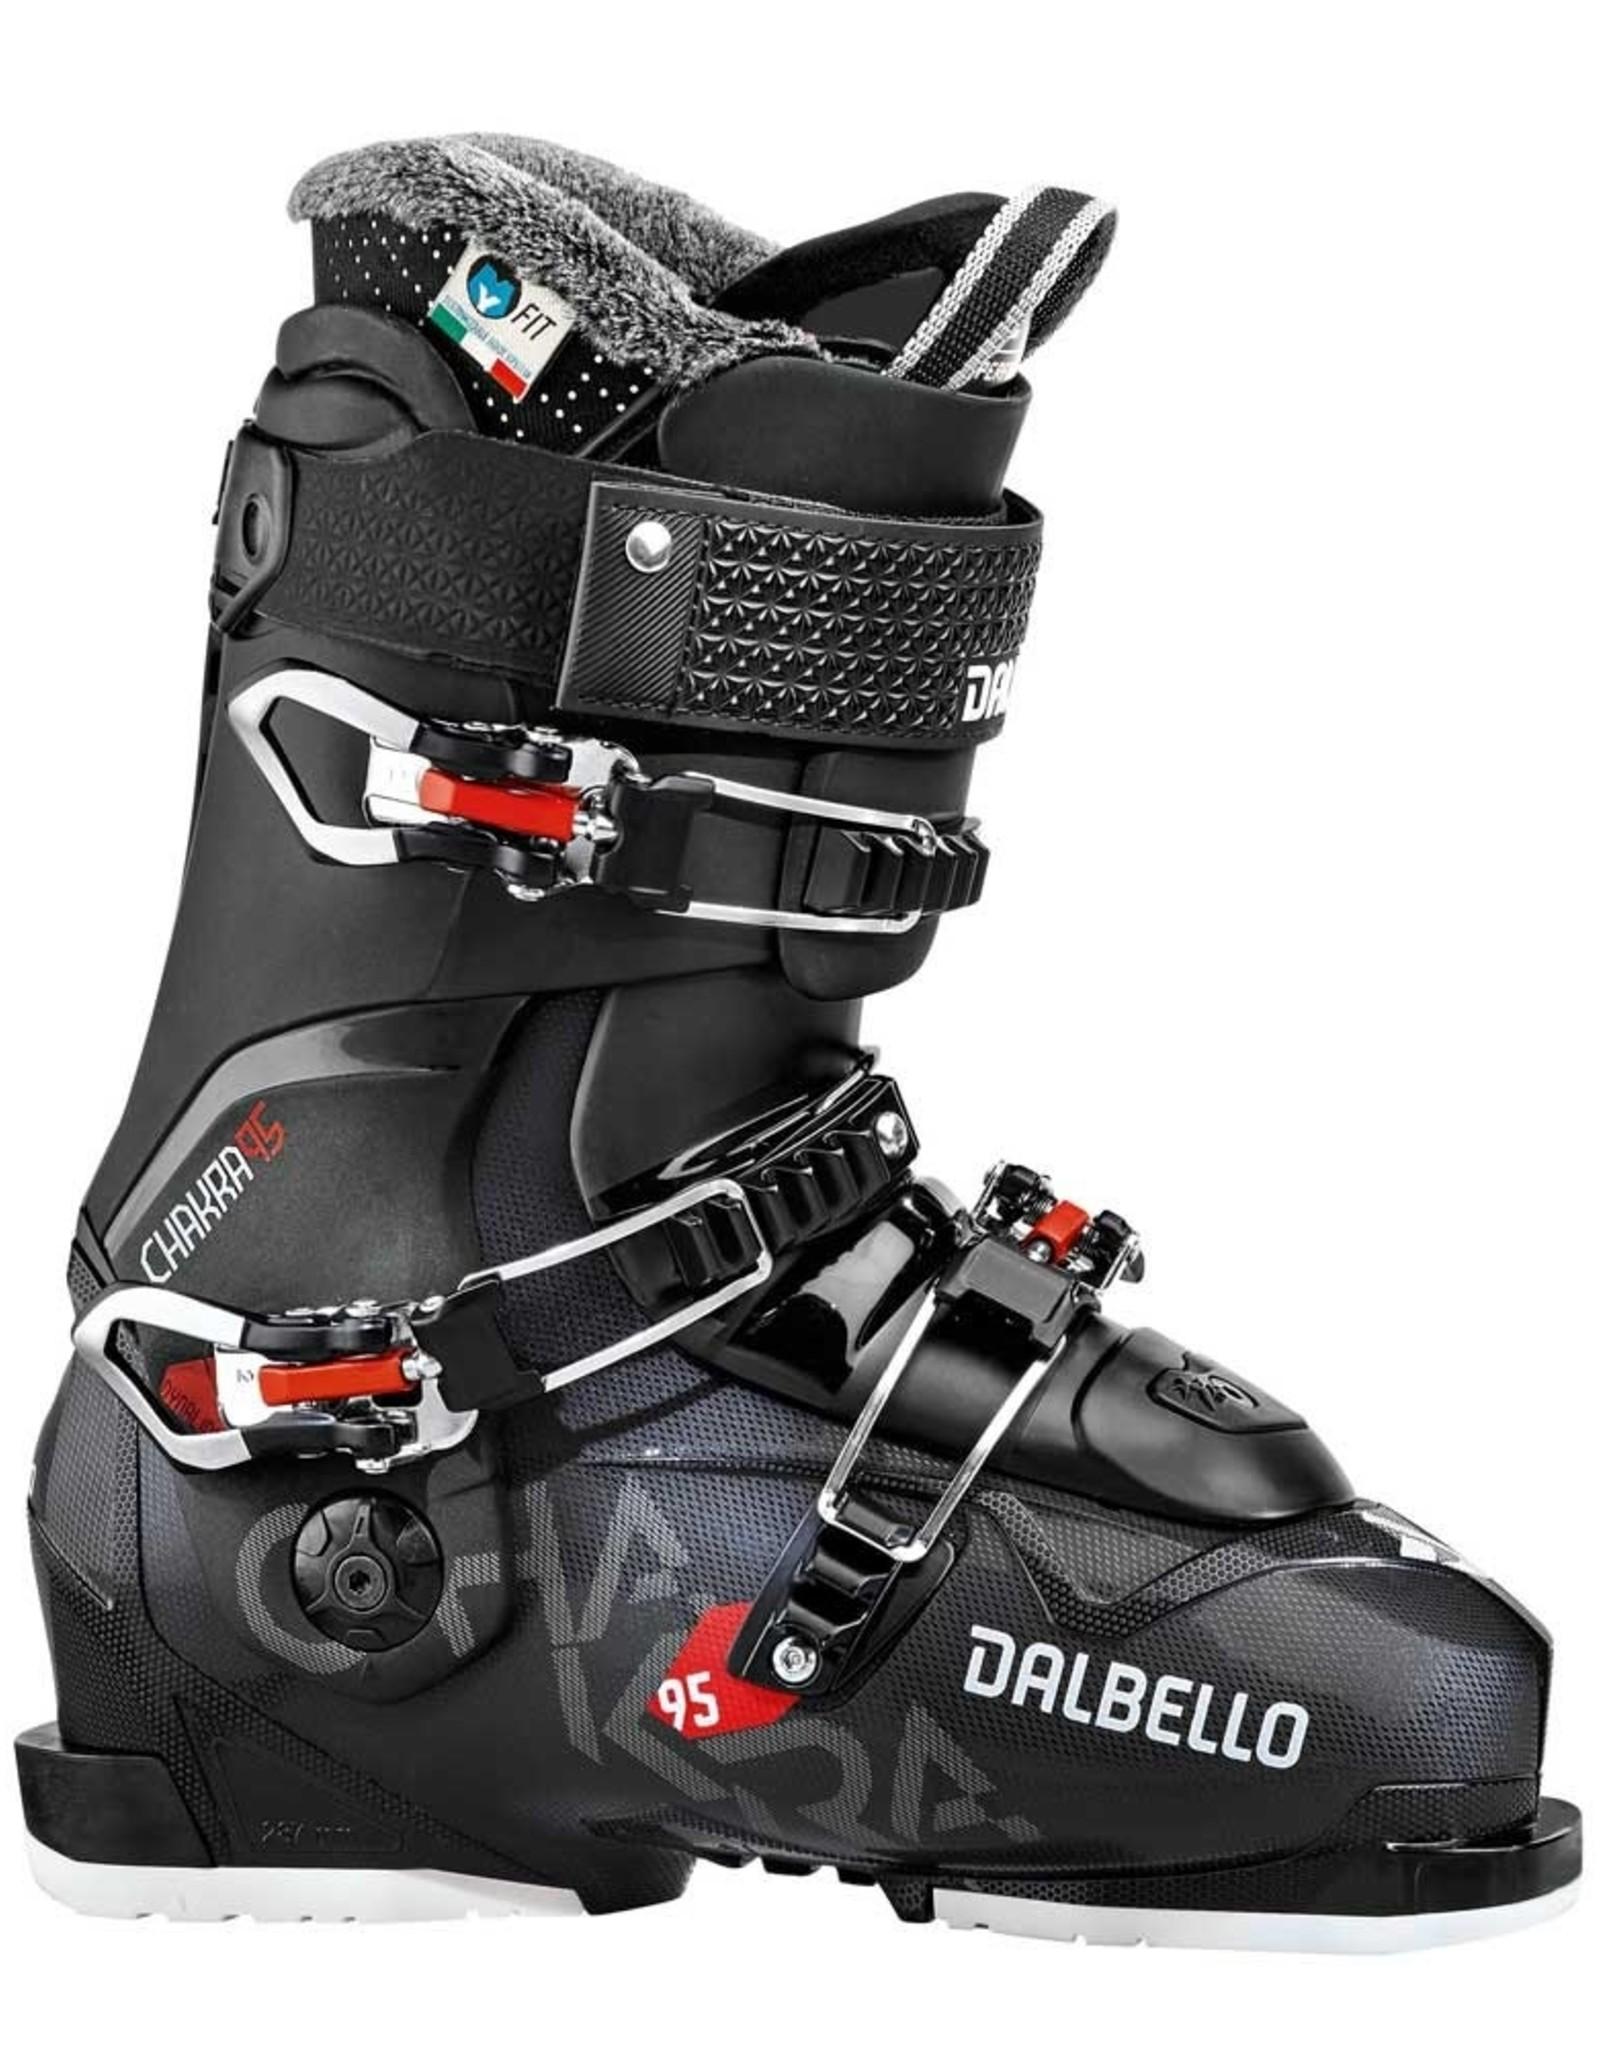 DALBELLO DALBELLO Ski Boots CHAKRA 95 (18/19)